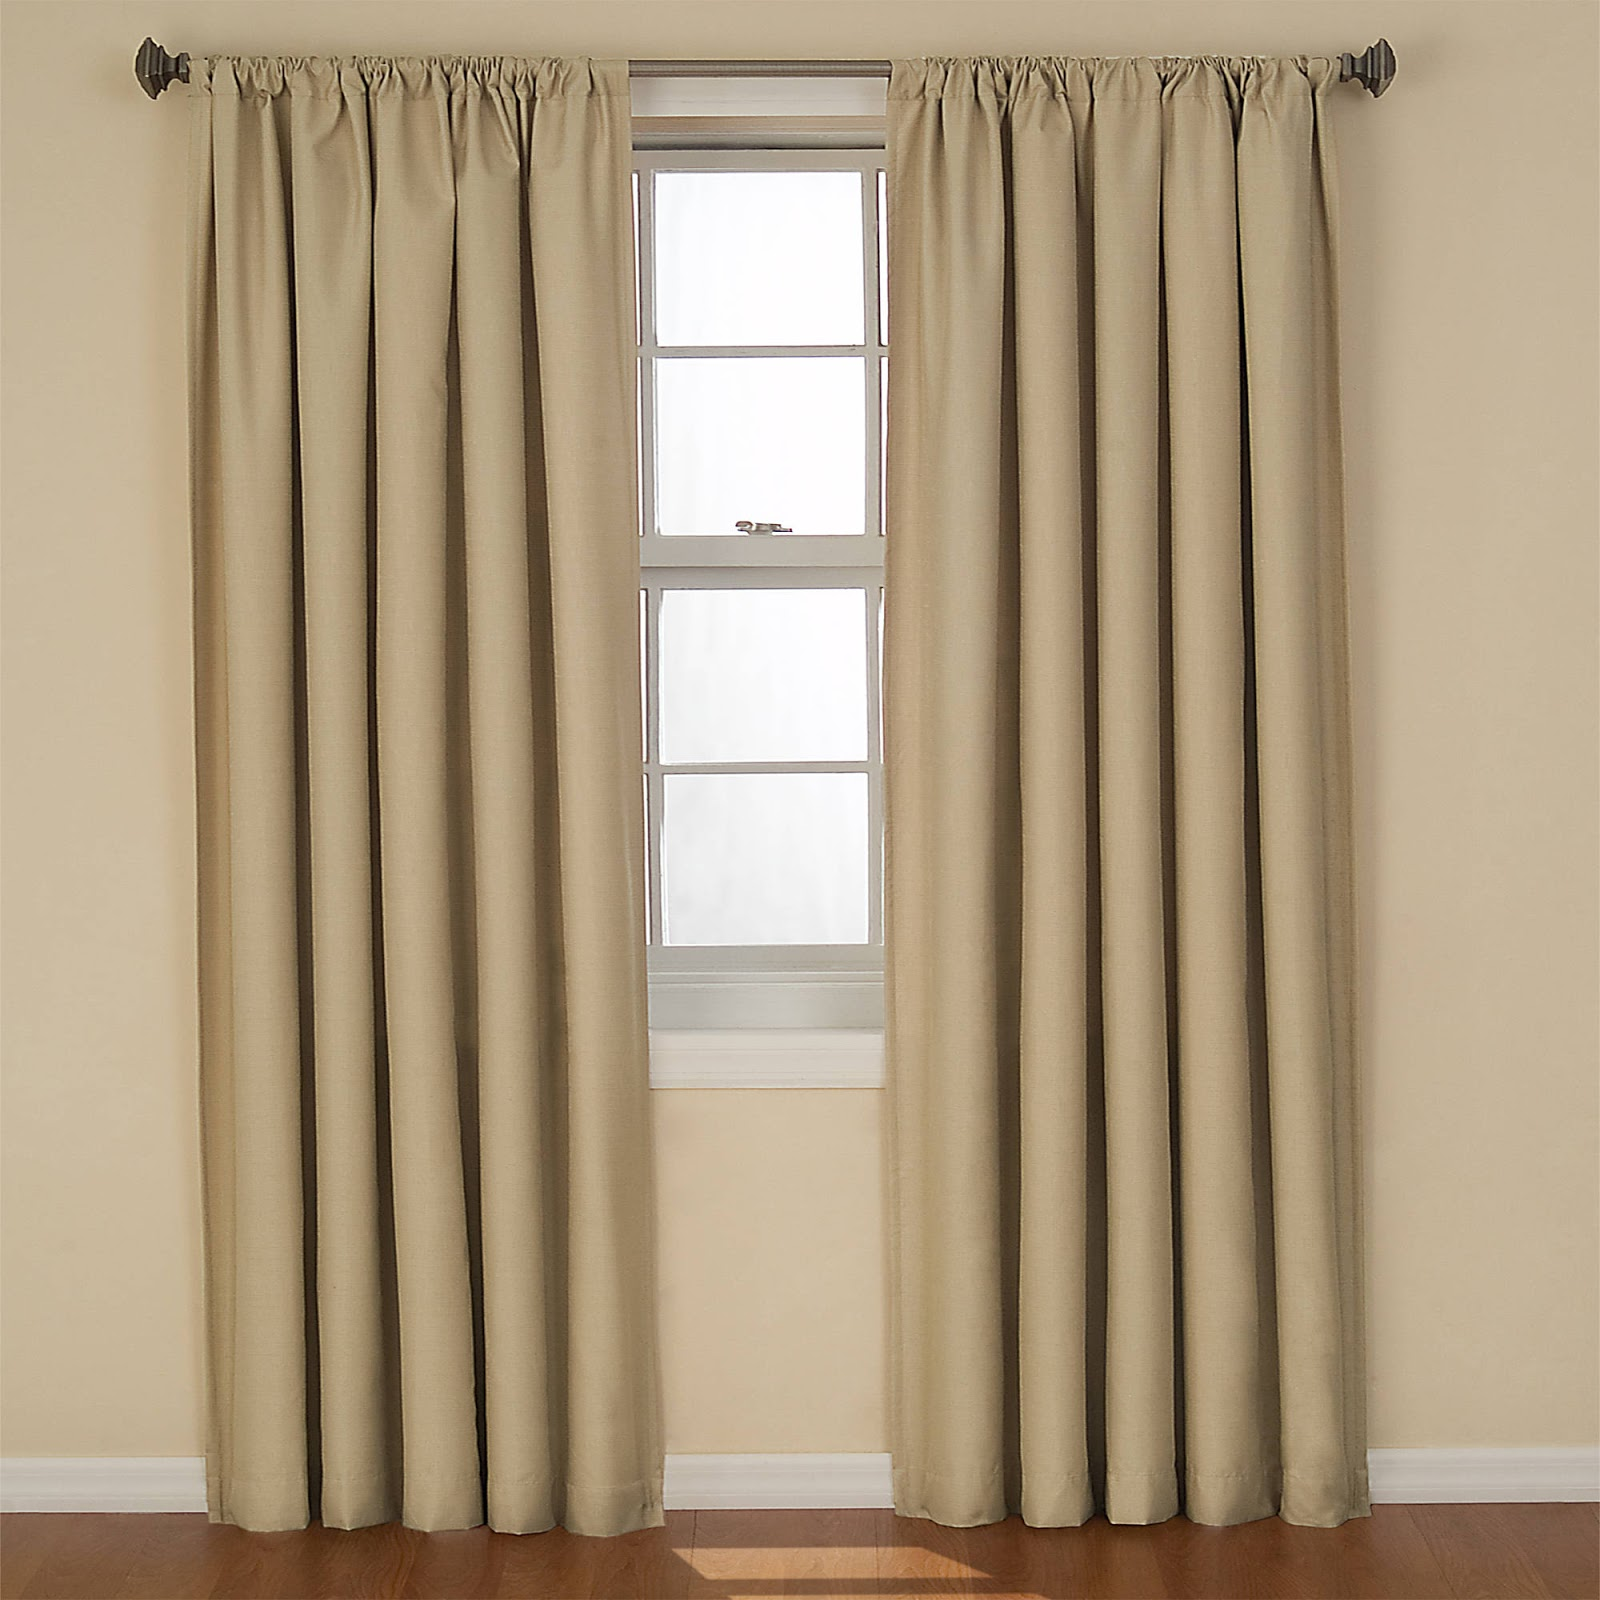 Bathroom Curtain Designs Ideas For Shower Windows Pinterest